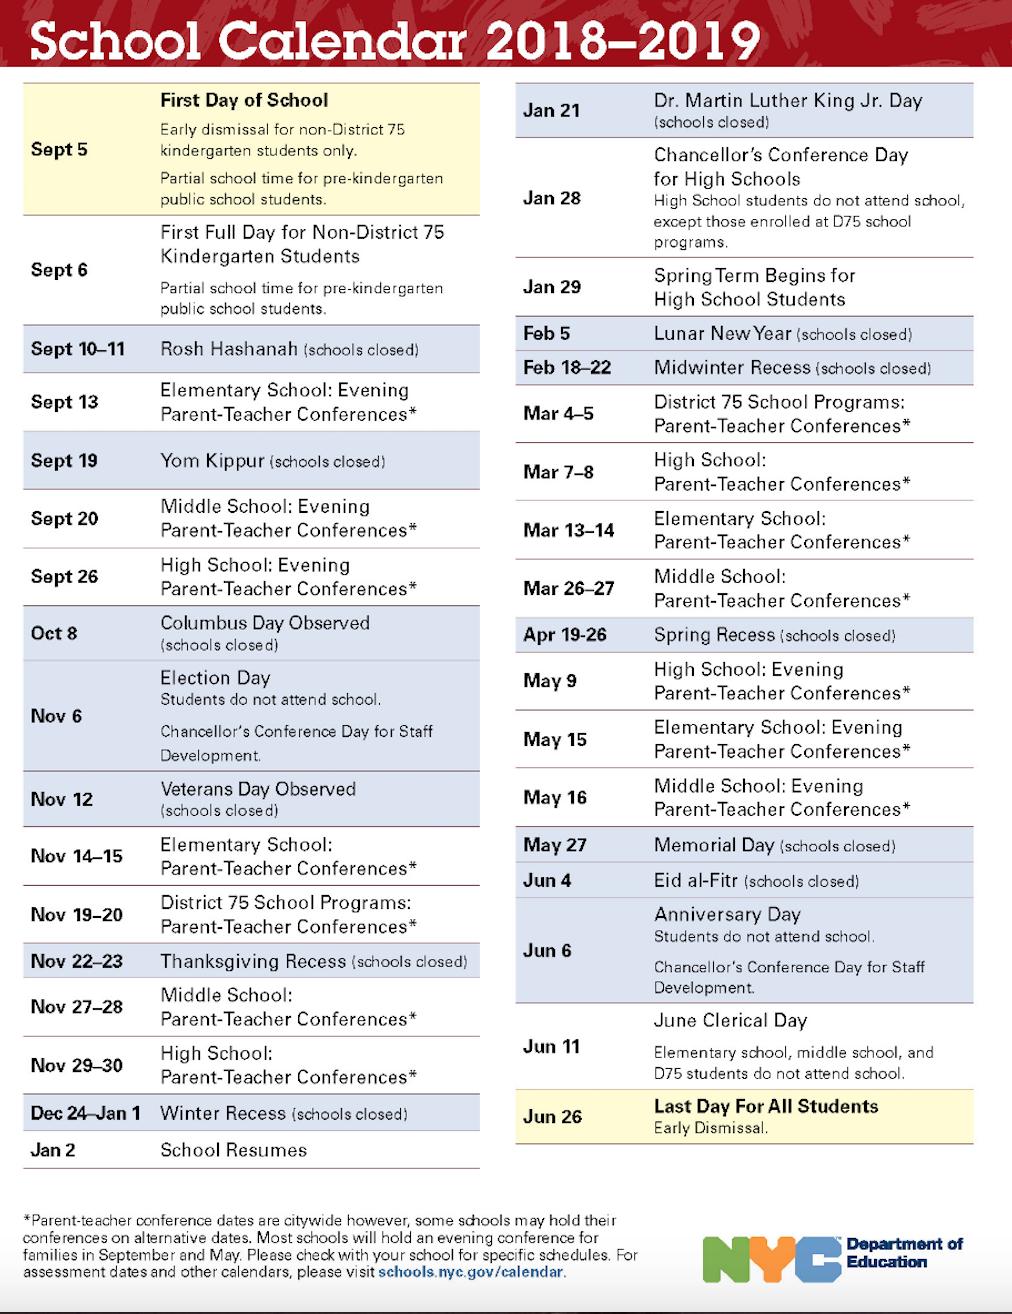 Nyc Doe 2018 2019 School Calendar | Ps 373R Robert Randall Within Board Of Education Calendar